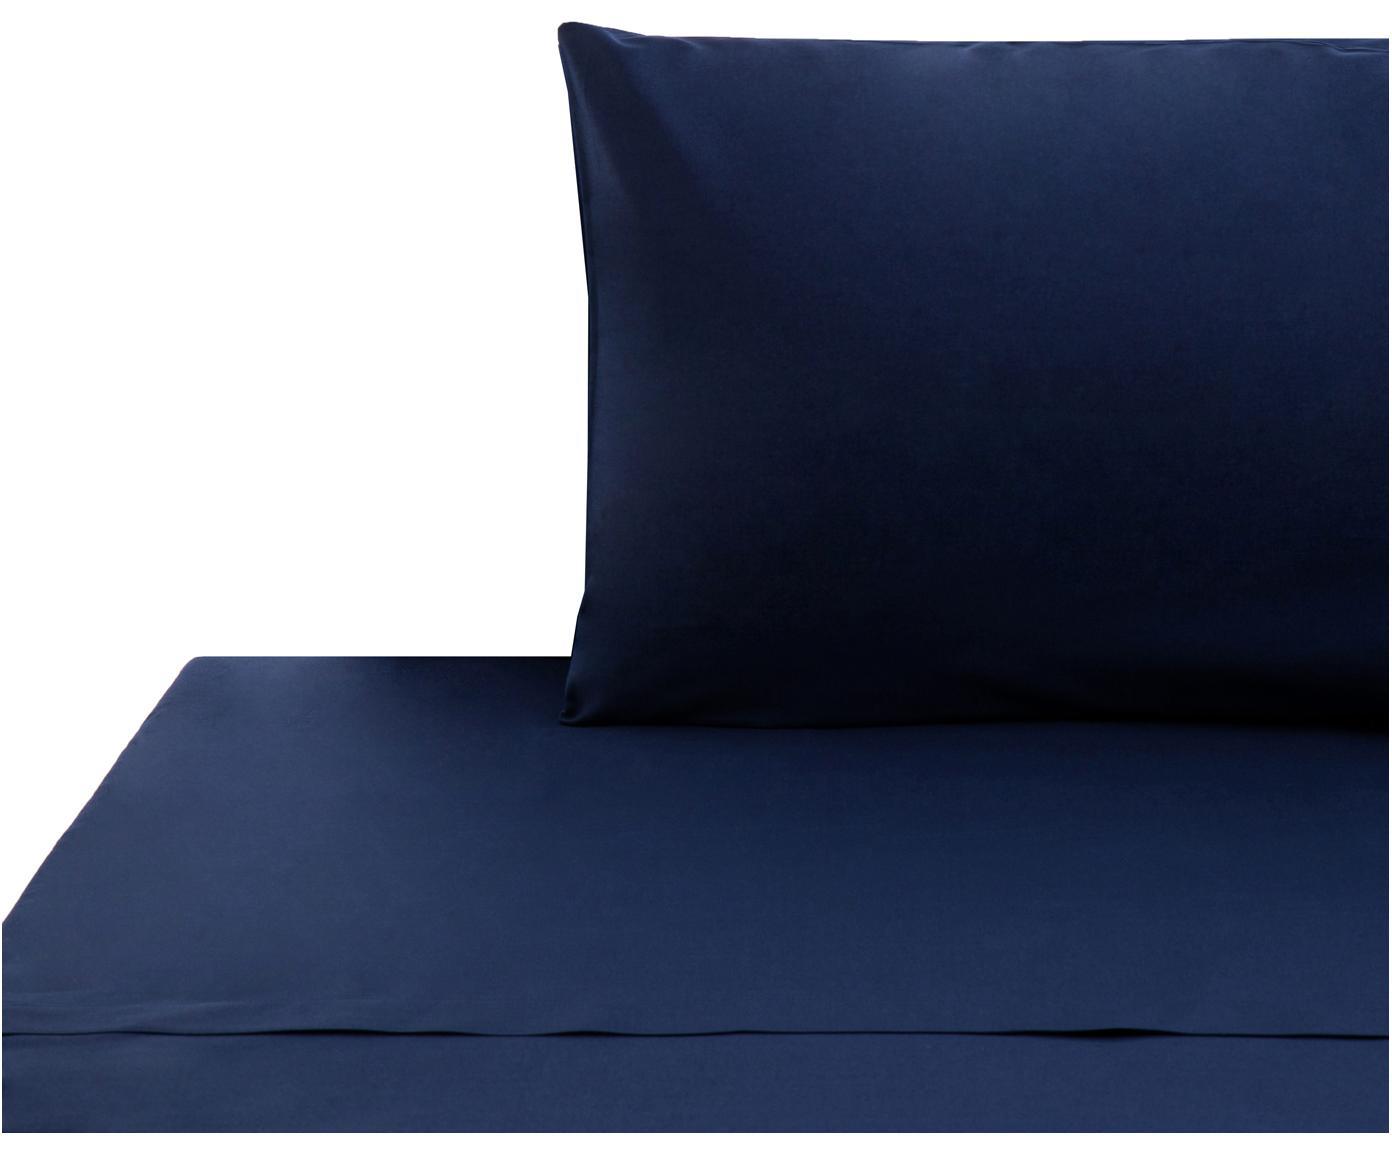 Set lenzuola in cotone ranforce Lenare 2 pz, Tessuto: Renforcé, Fronte e retro: blu scuro, 150 x 290 cm